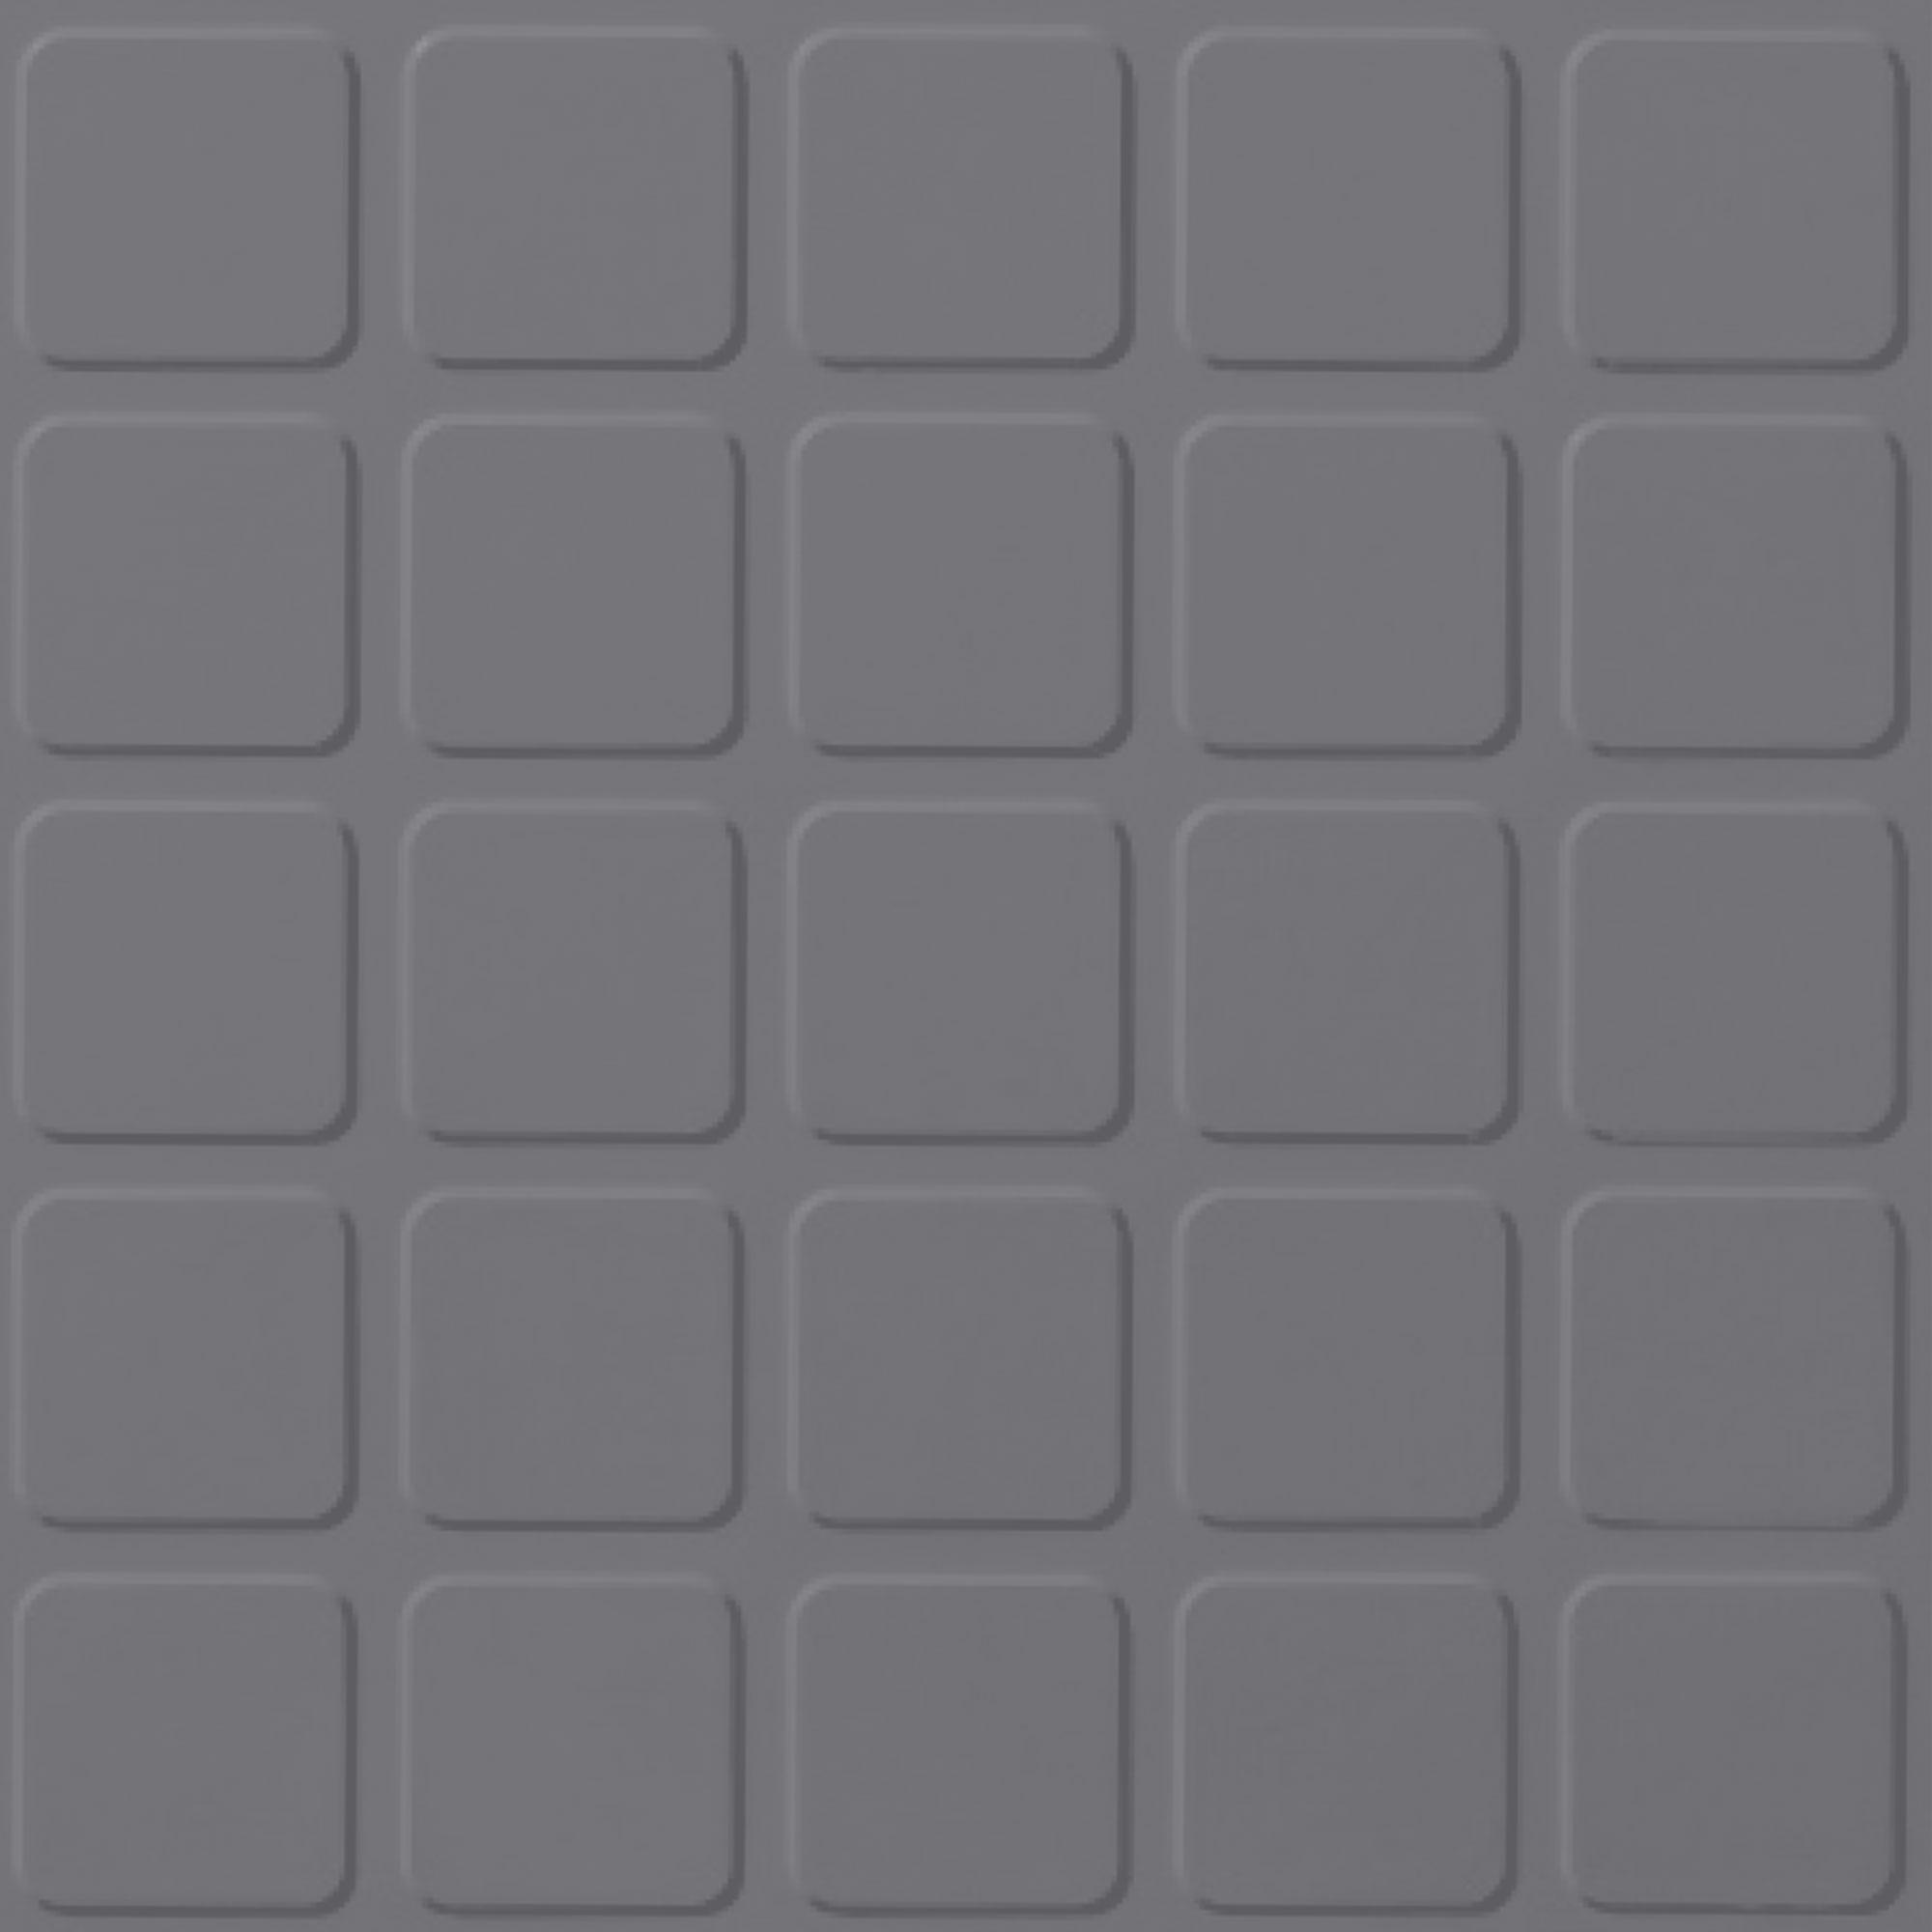 Roppe Rubber Tile 900 - Raised Square Design (994) Steel Gray Rubber Flooring